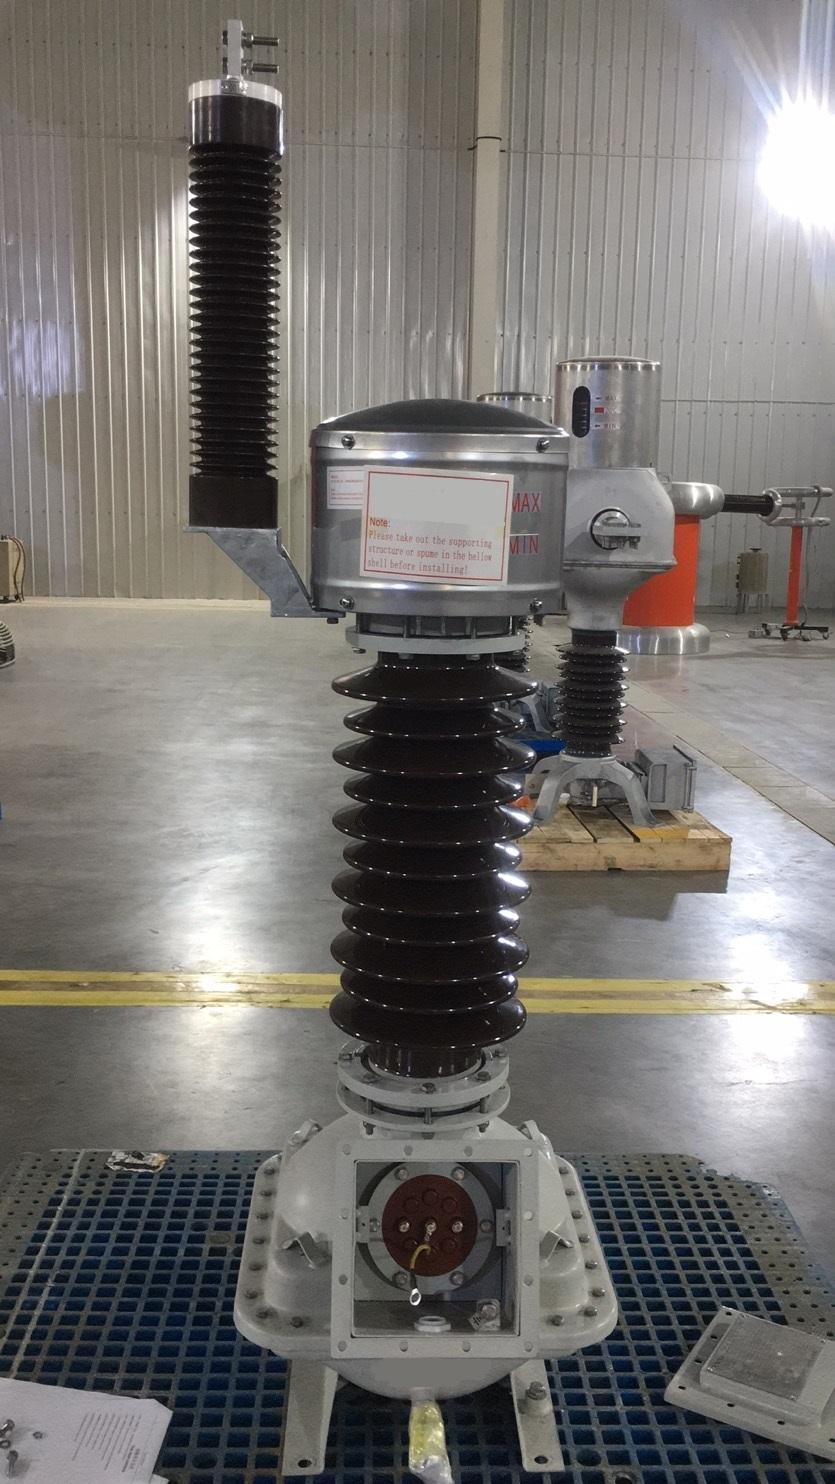 Testing a 27.5kV Voltage Transformer